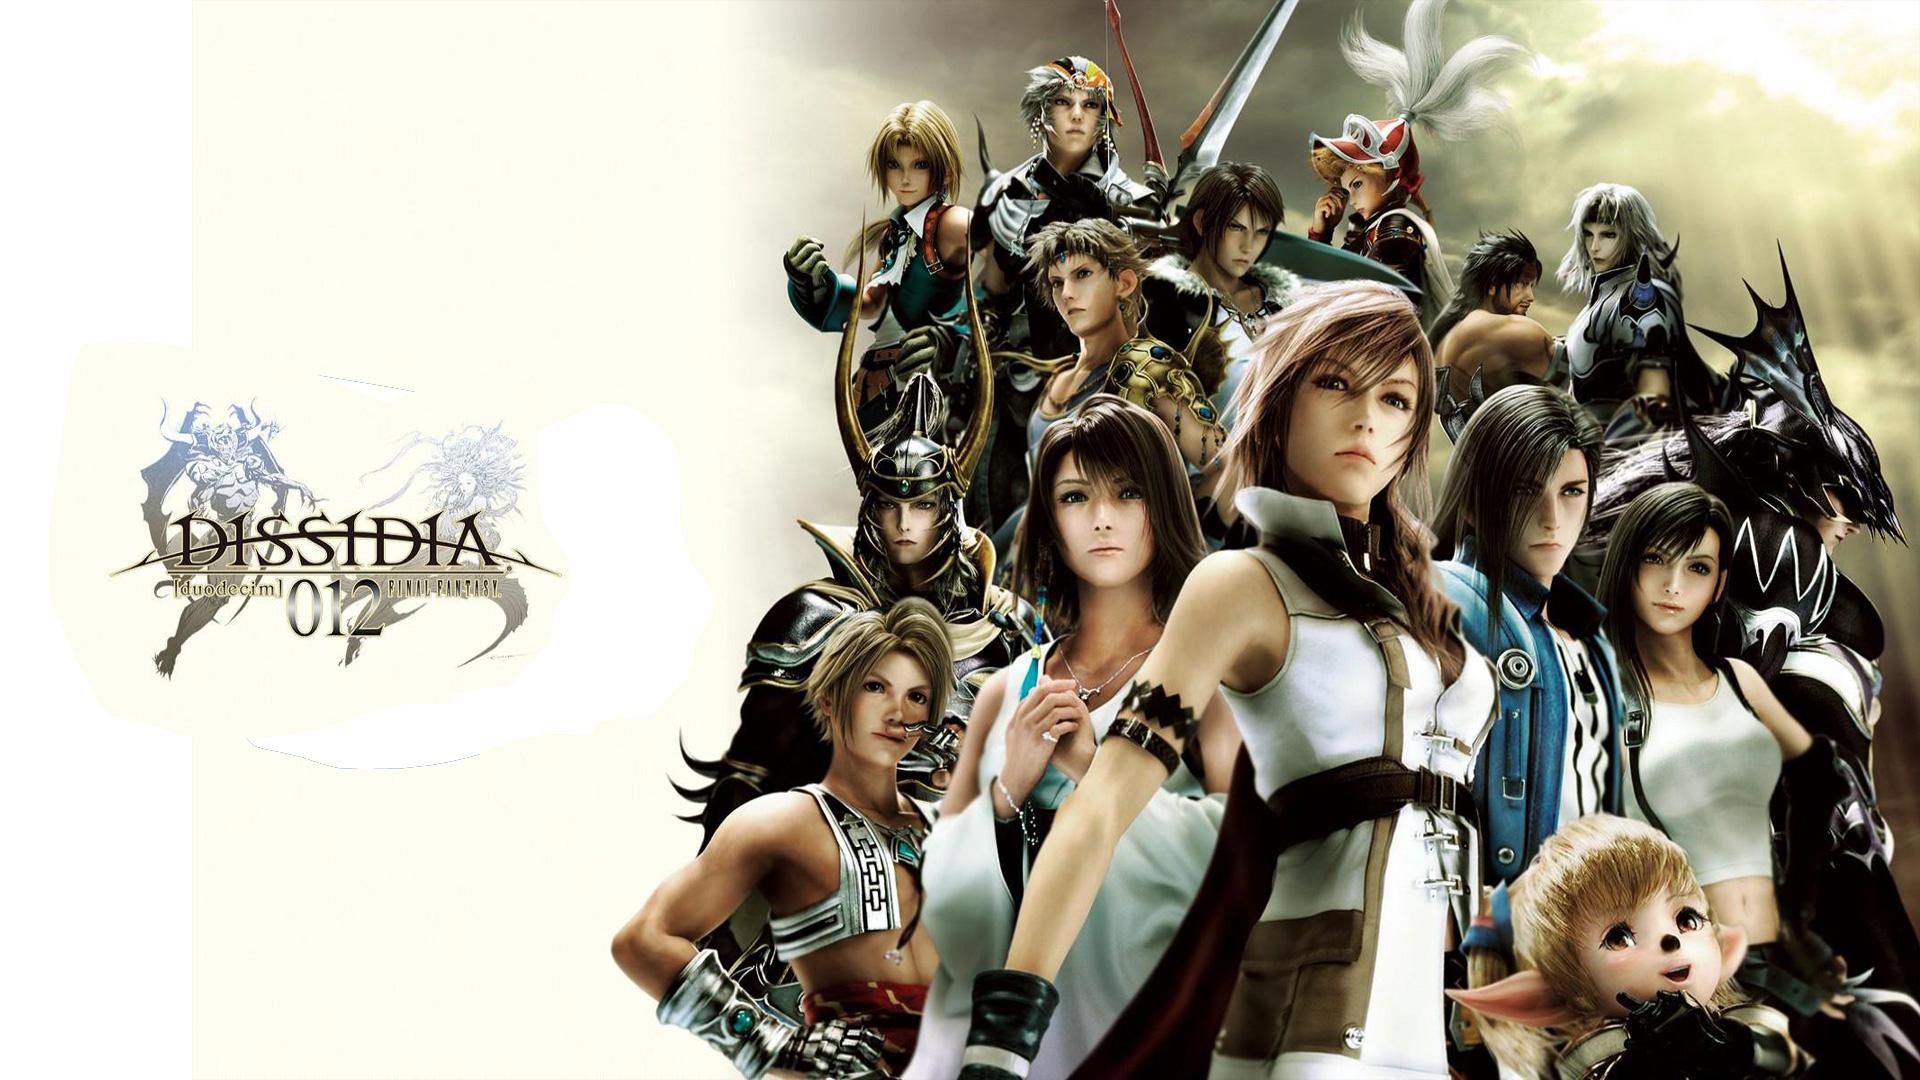 Final Fantasy Xiv Ps3 Battlefield 4 Wallpaper 16528 Hd Wallpapers 1920x1080